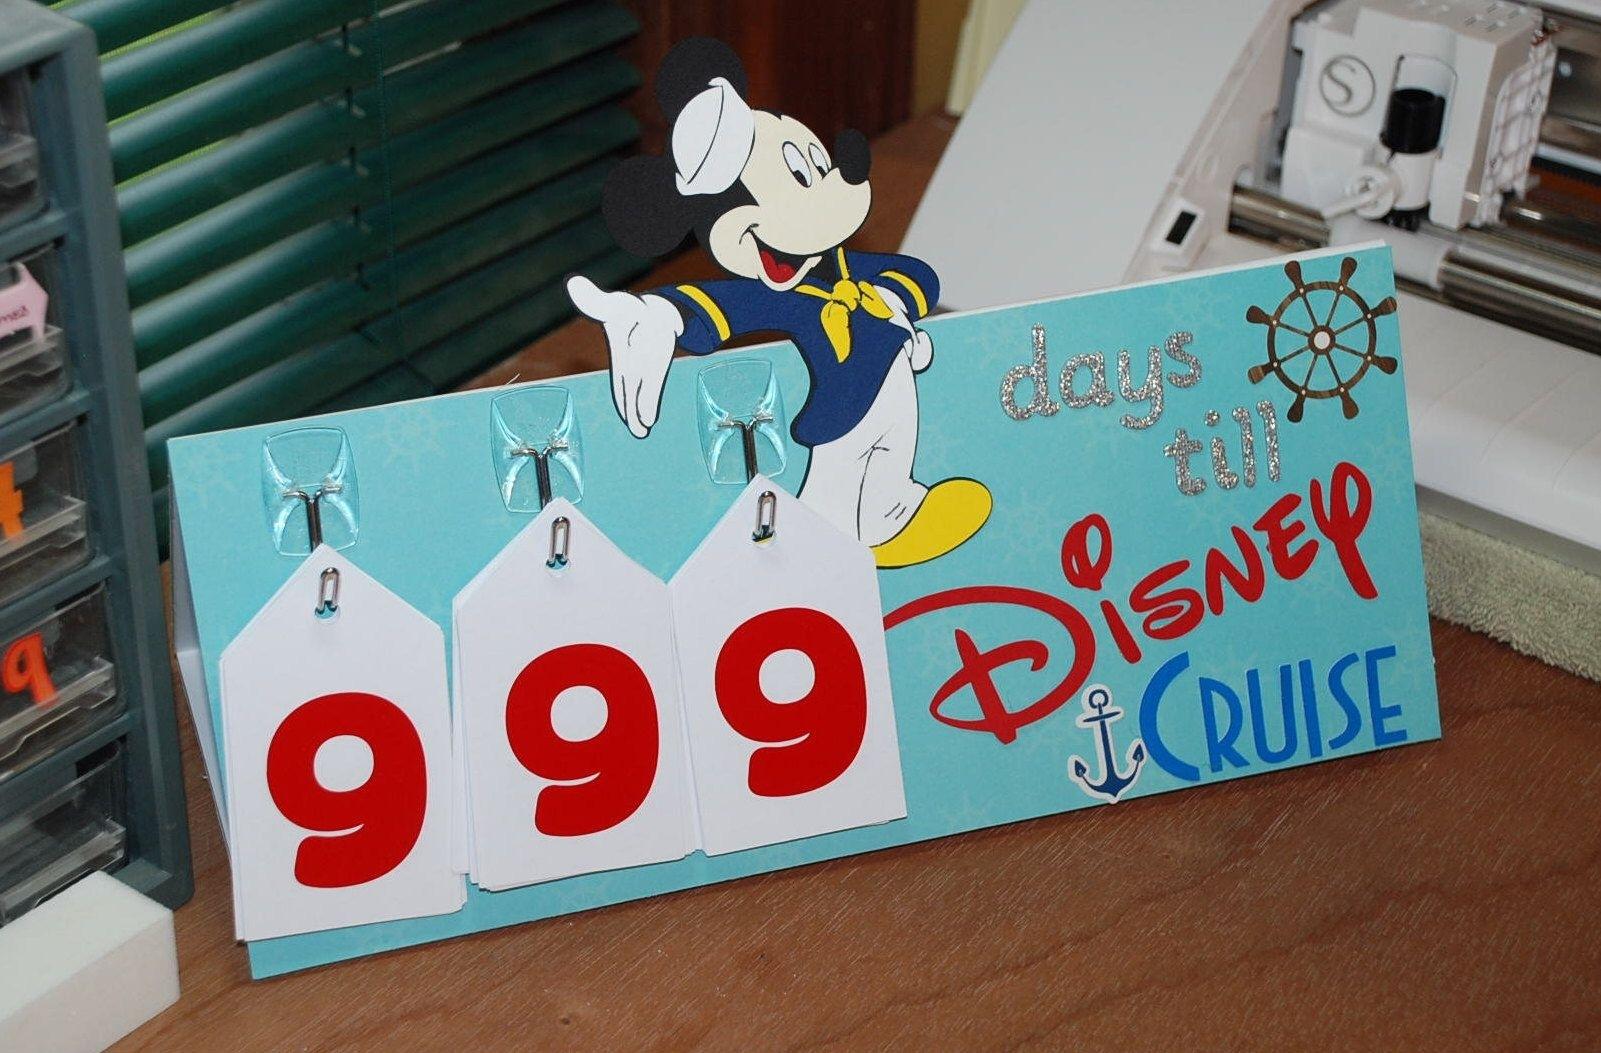 Pinpam Pilger On Disney Cruise | Countdown Calendar with regard to Count Diwn Calendar Fir Disney Cruise